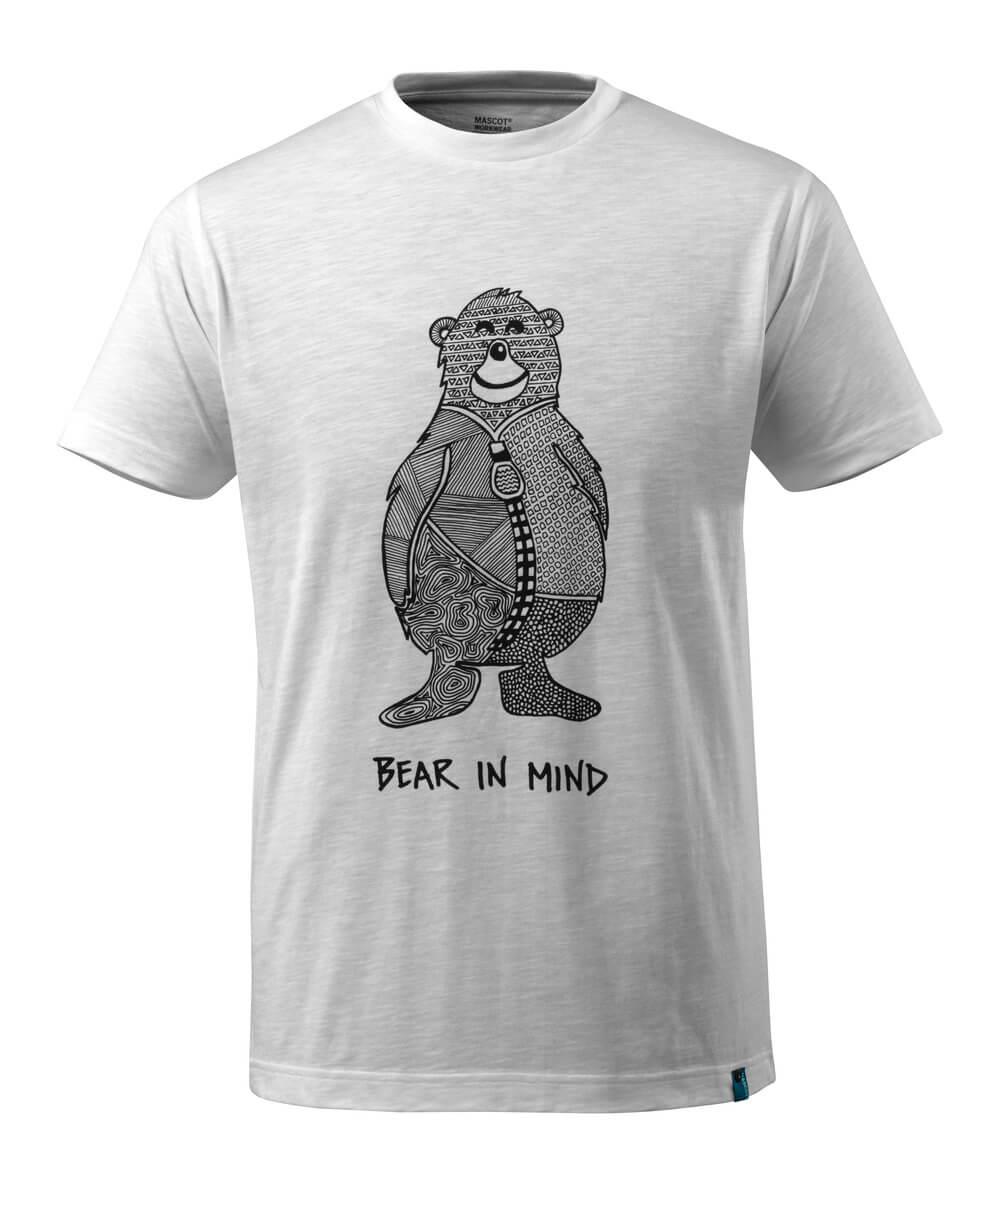 17381-983-06 T-Shirt - Weiß